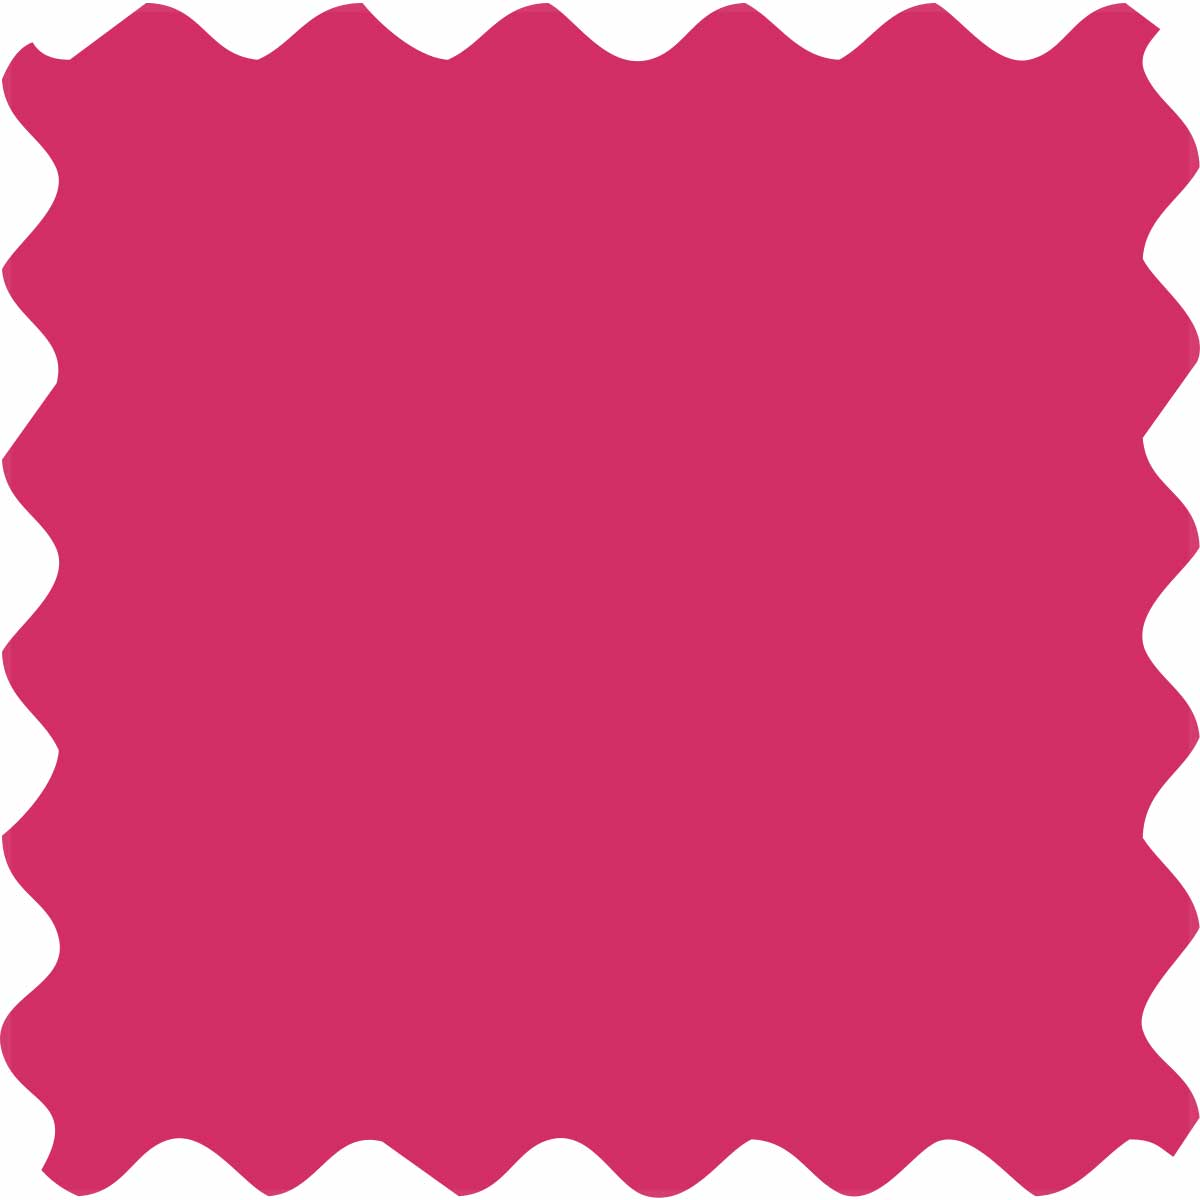 Fabric Creations™ Plush™ 3-D Fabric Paints - Fruit Punch, 2 oz.